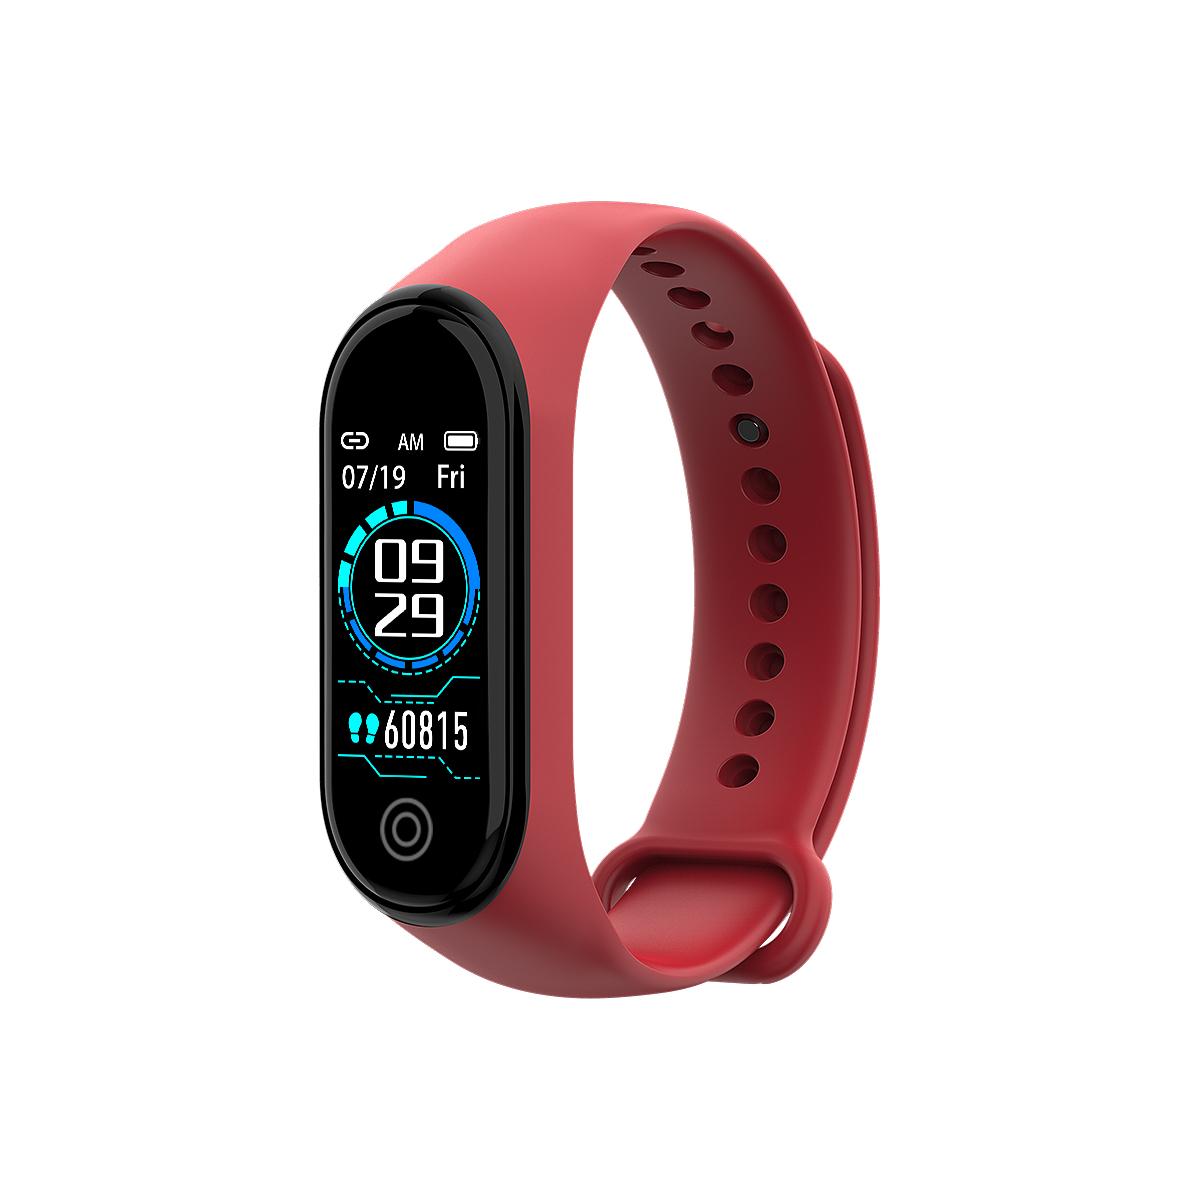 New RD05 Bracelet Smart Watch Fitness Tracking Sports Bracelet Heart Rate Blood Pressure Smart Bracelet Health Monitor red